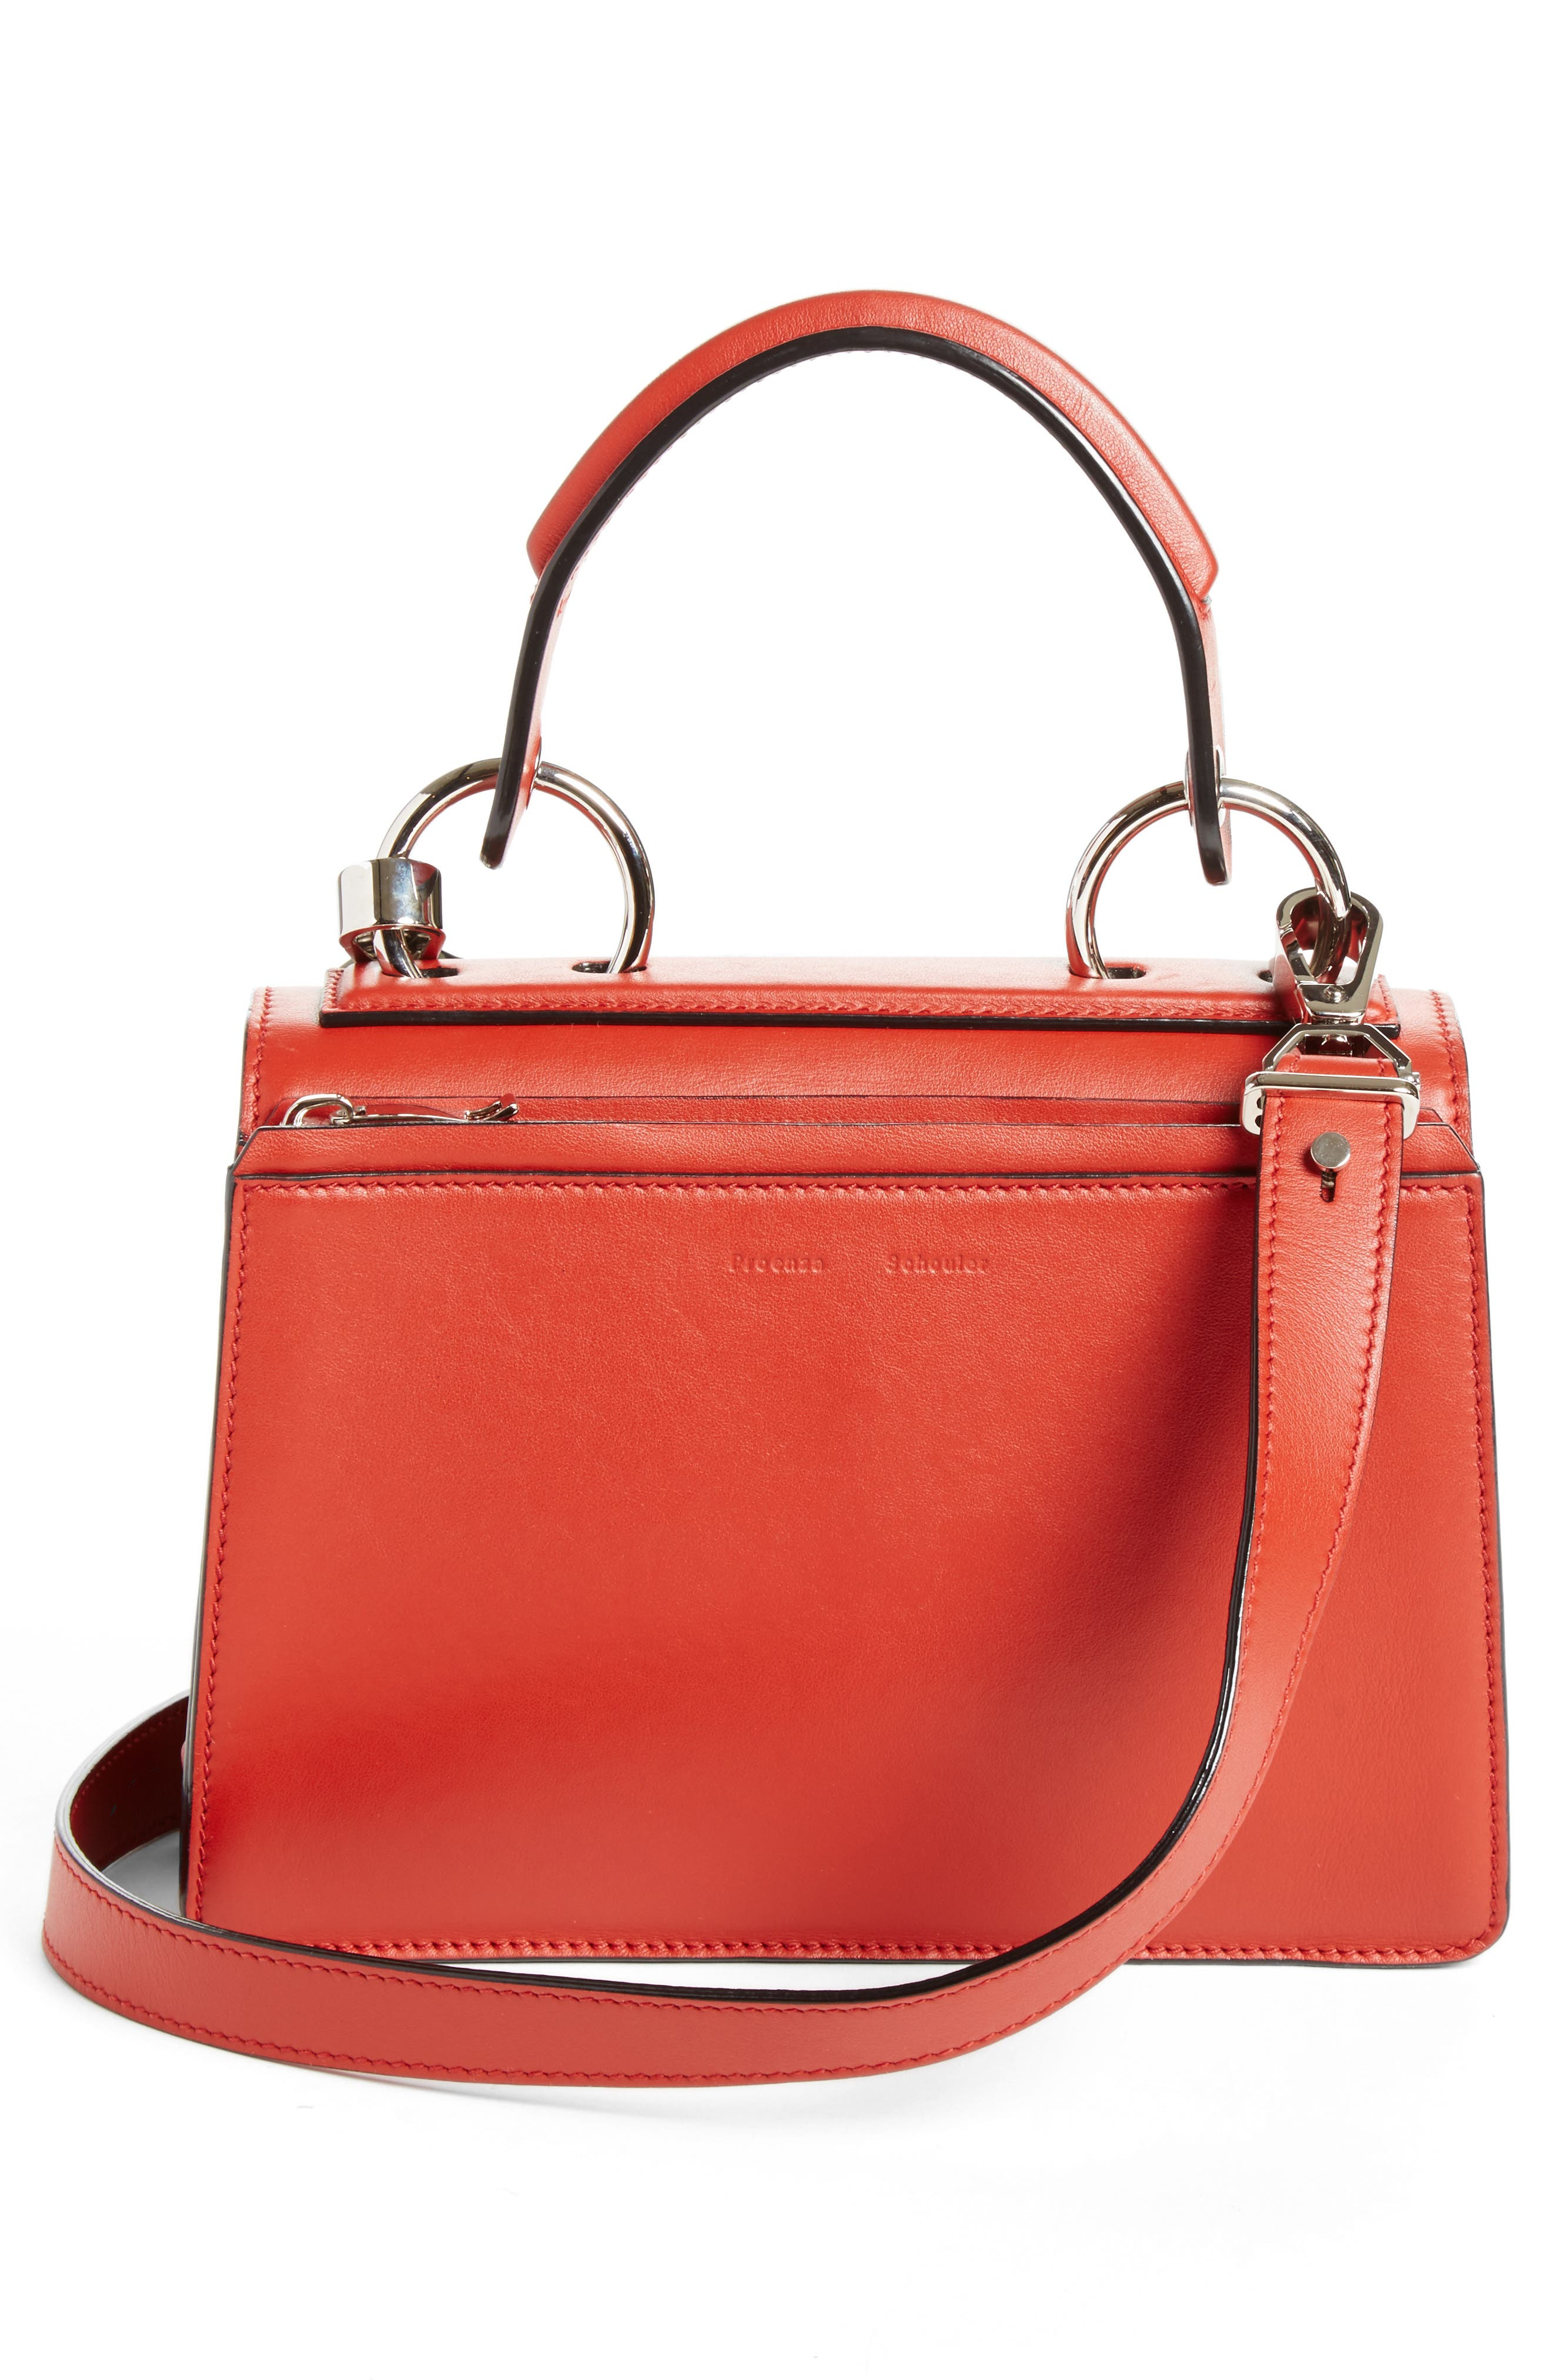 'Small Hava' Top Handle Calfskin Leather Satchel,                             Main thumbnail 2, color,